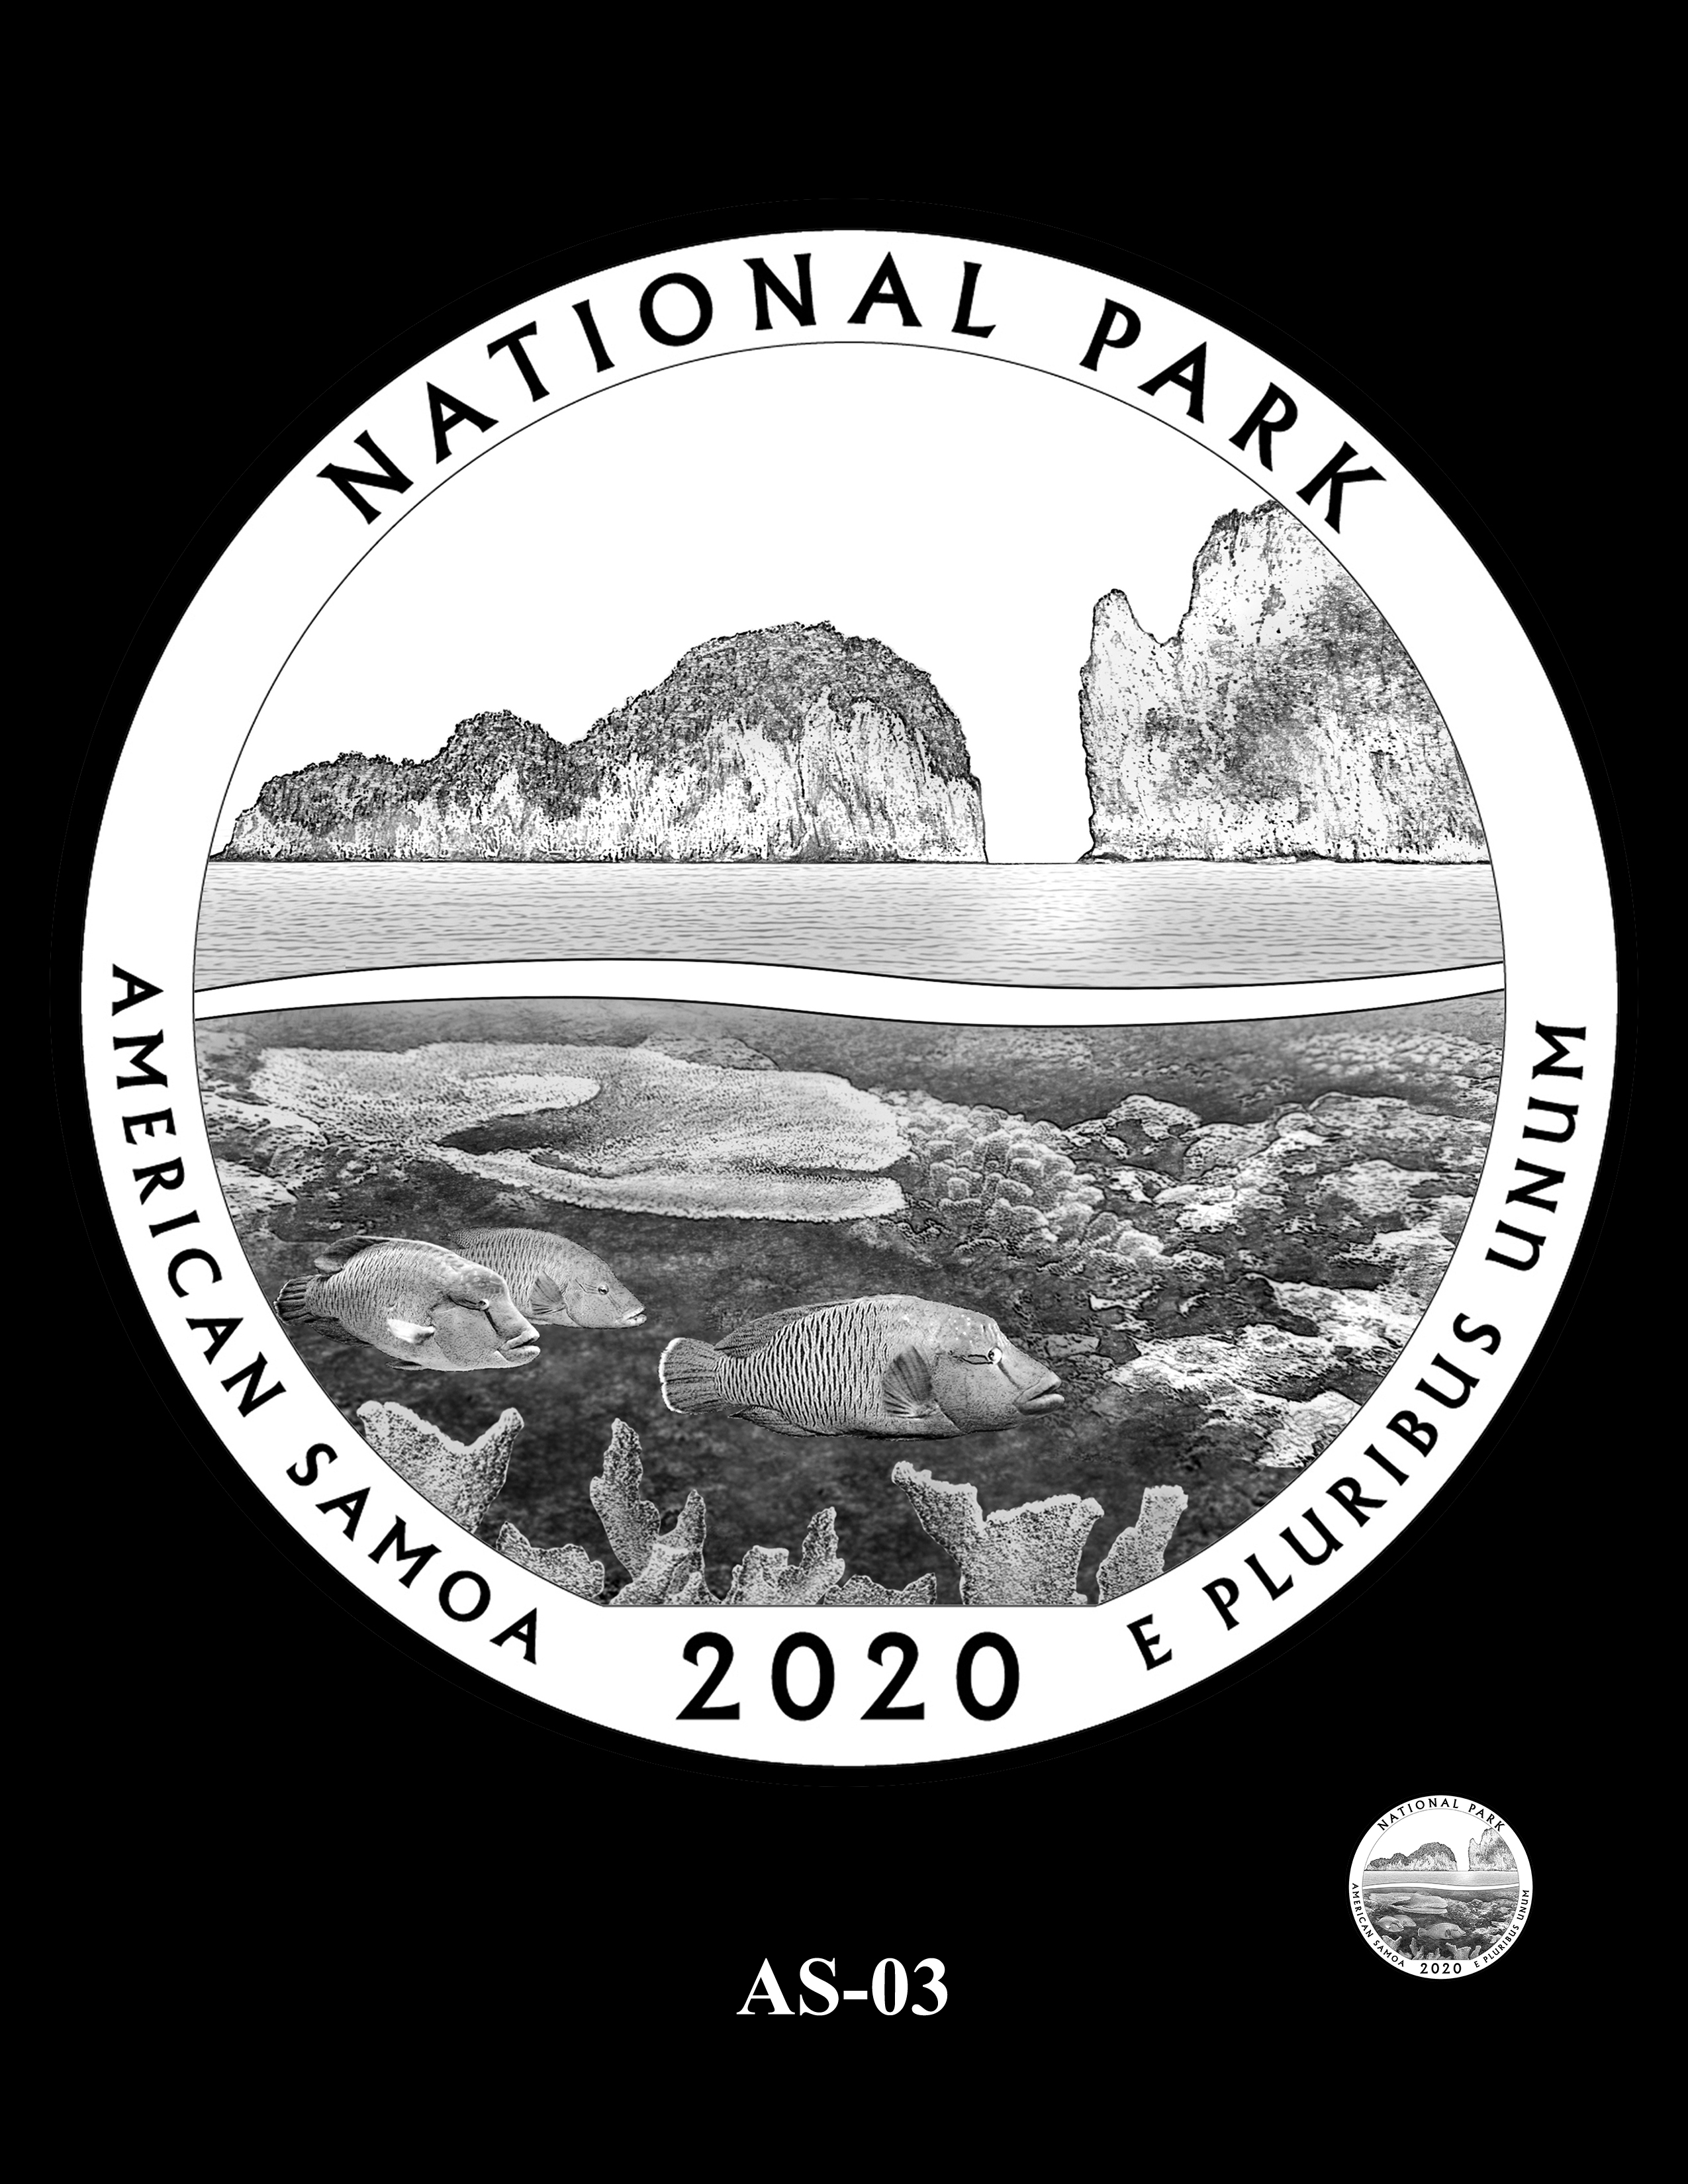 AS-03 -- 2020 America the Beautiful Quarters® Program